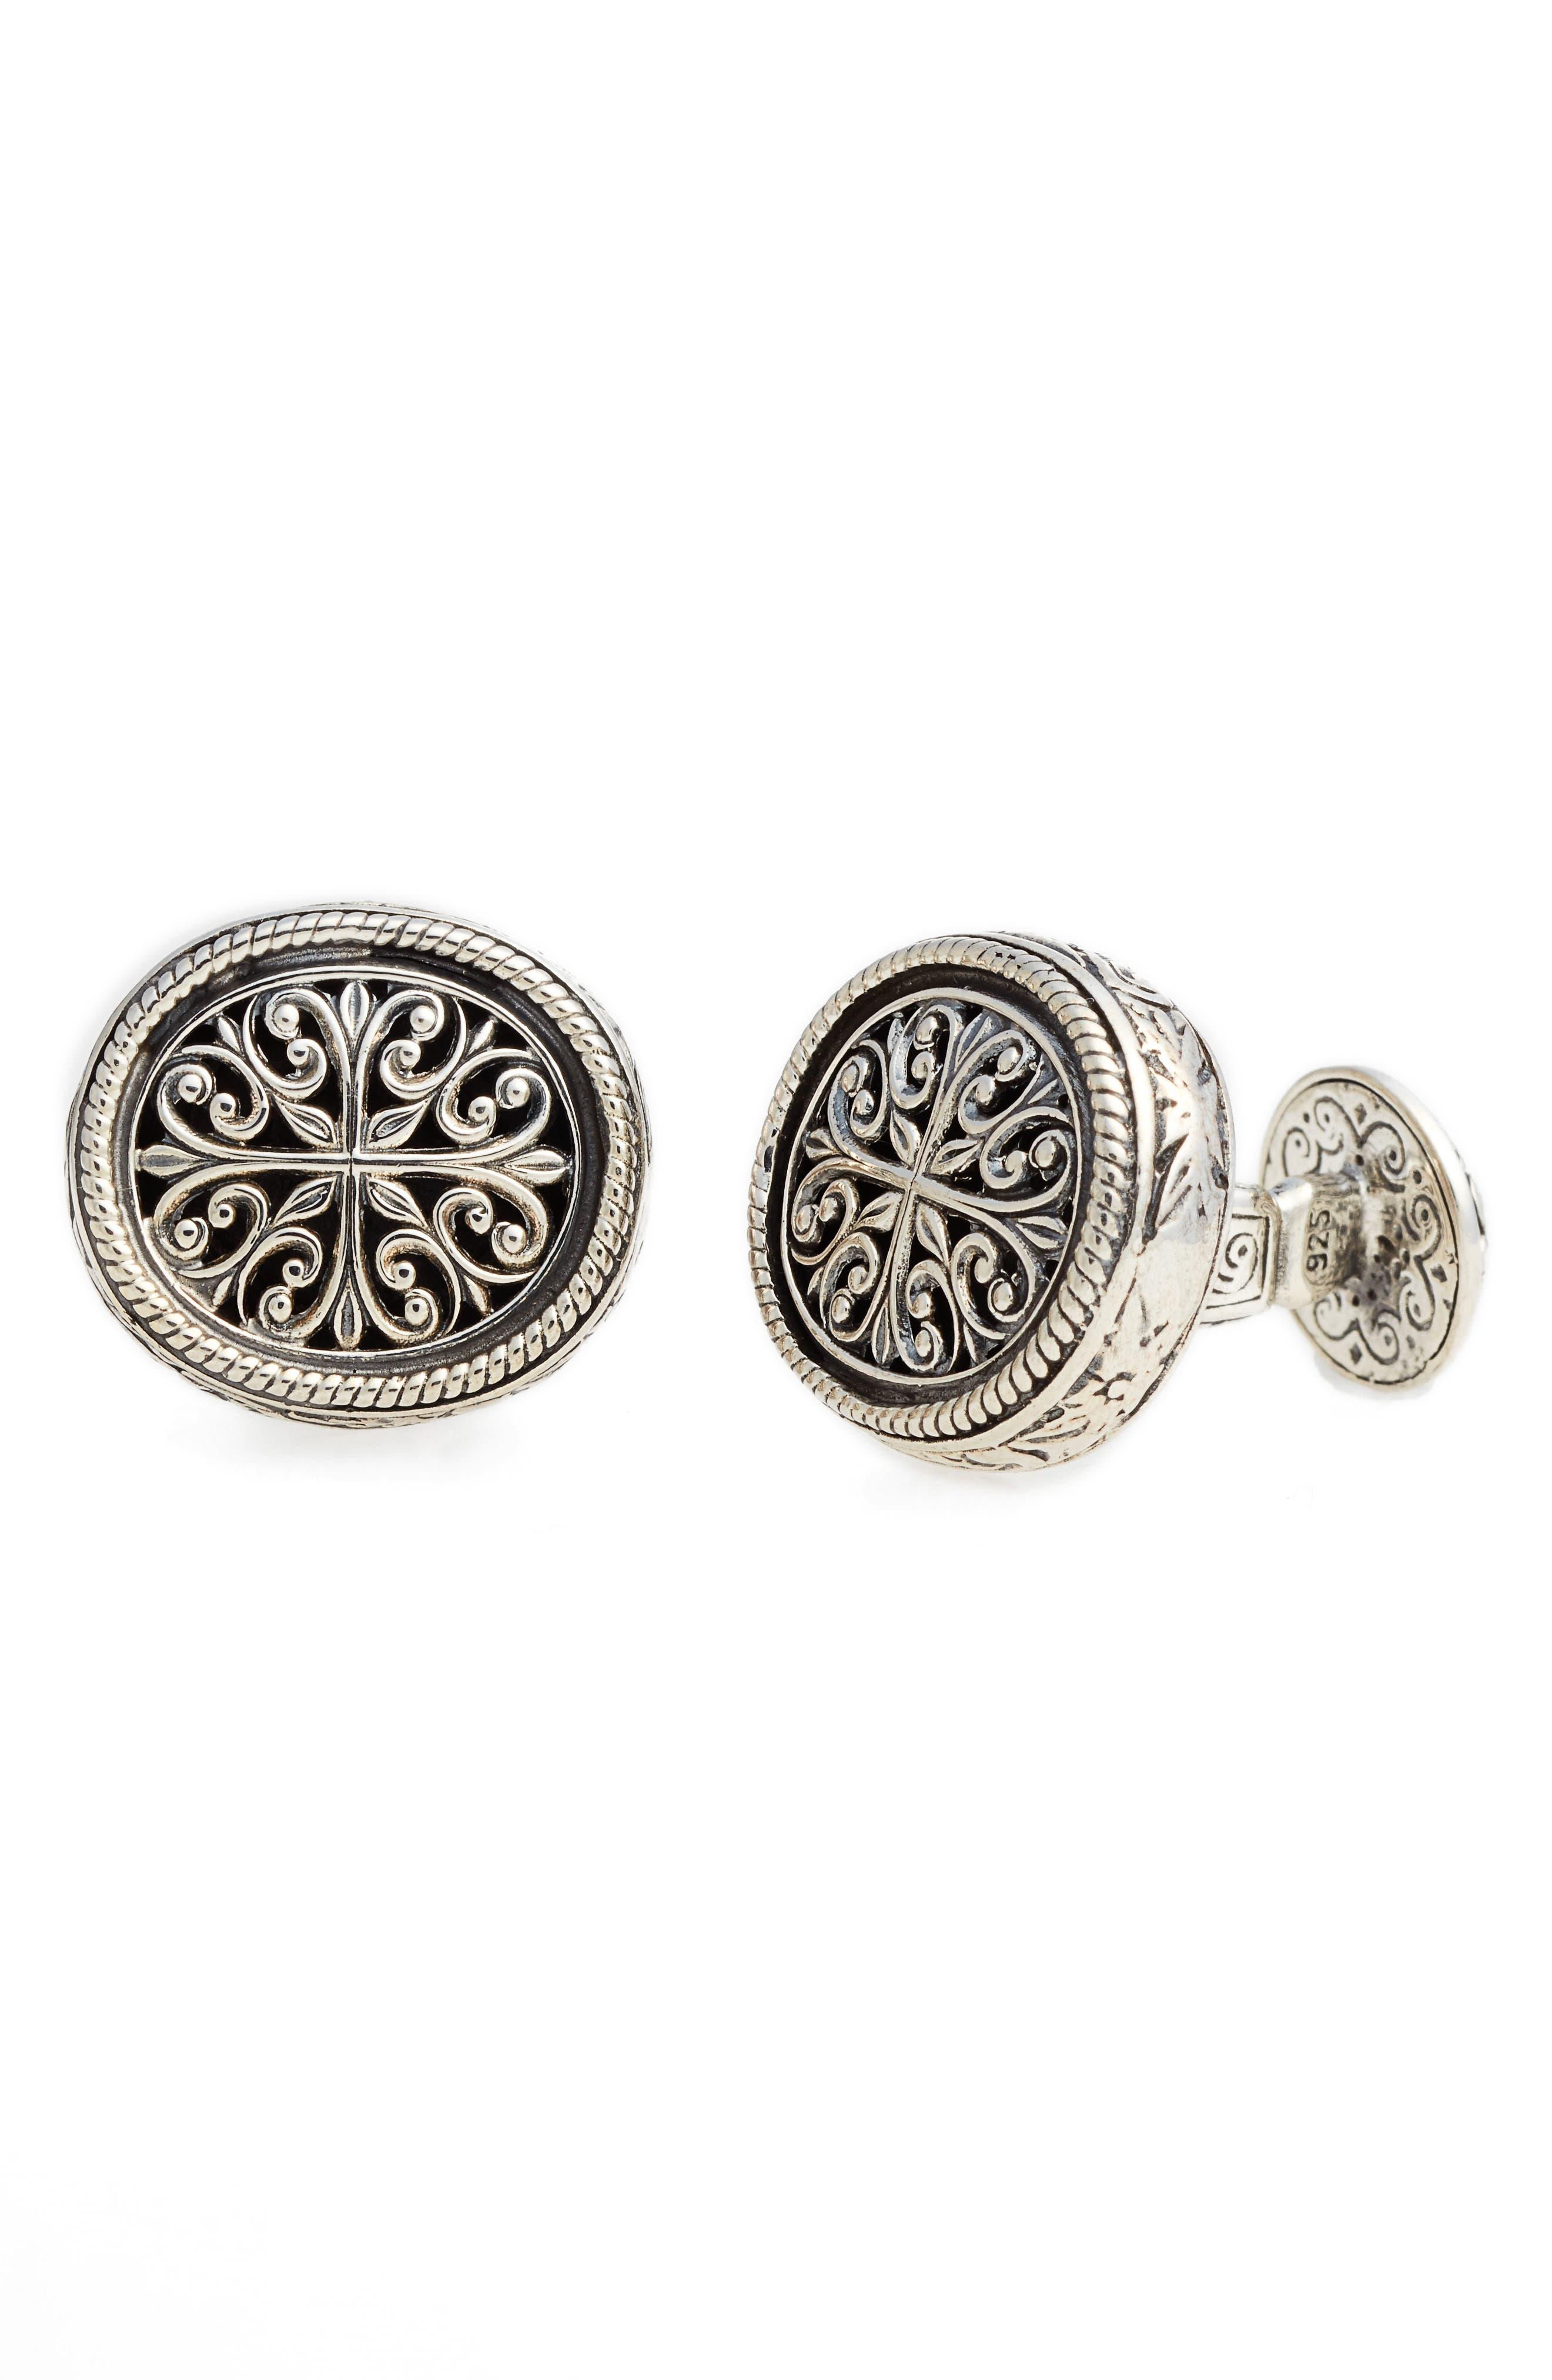 Filigree Oval Cufflinks,                         Main,                         color, Silver